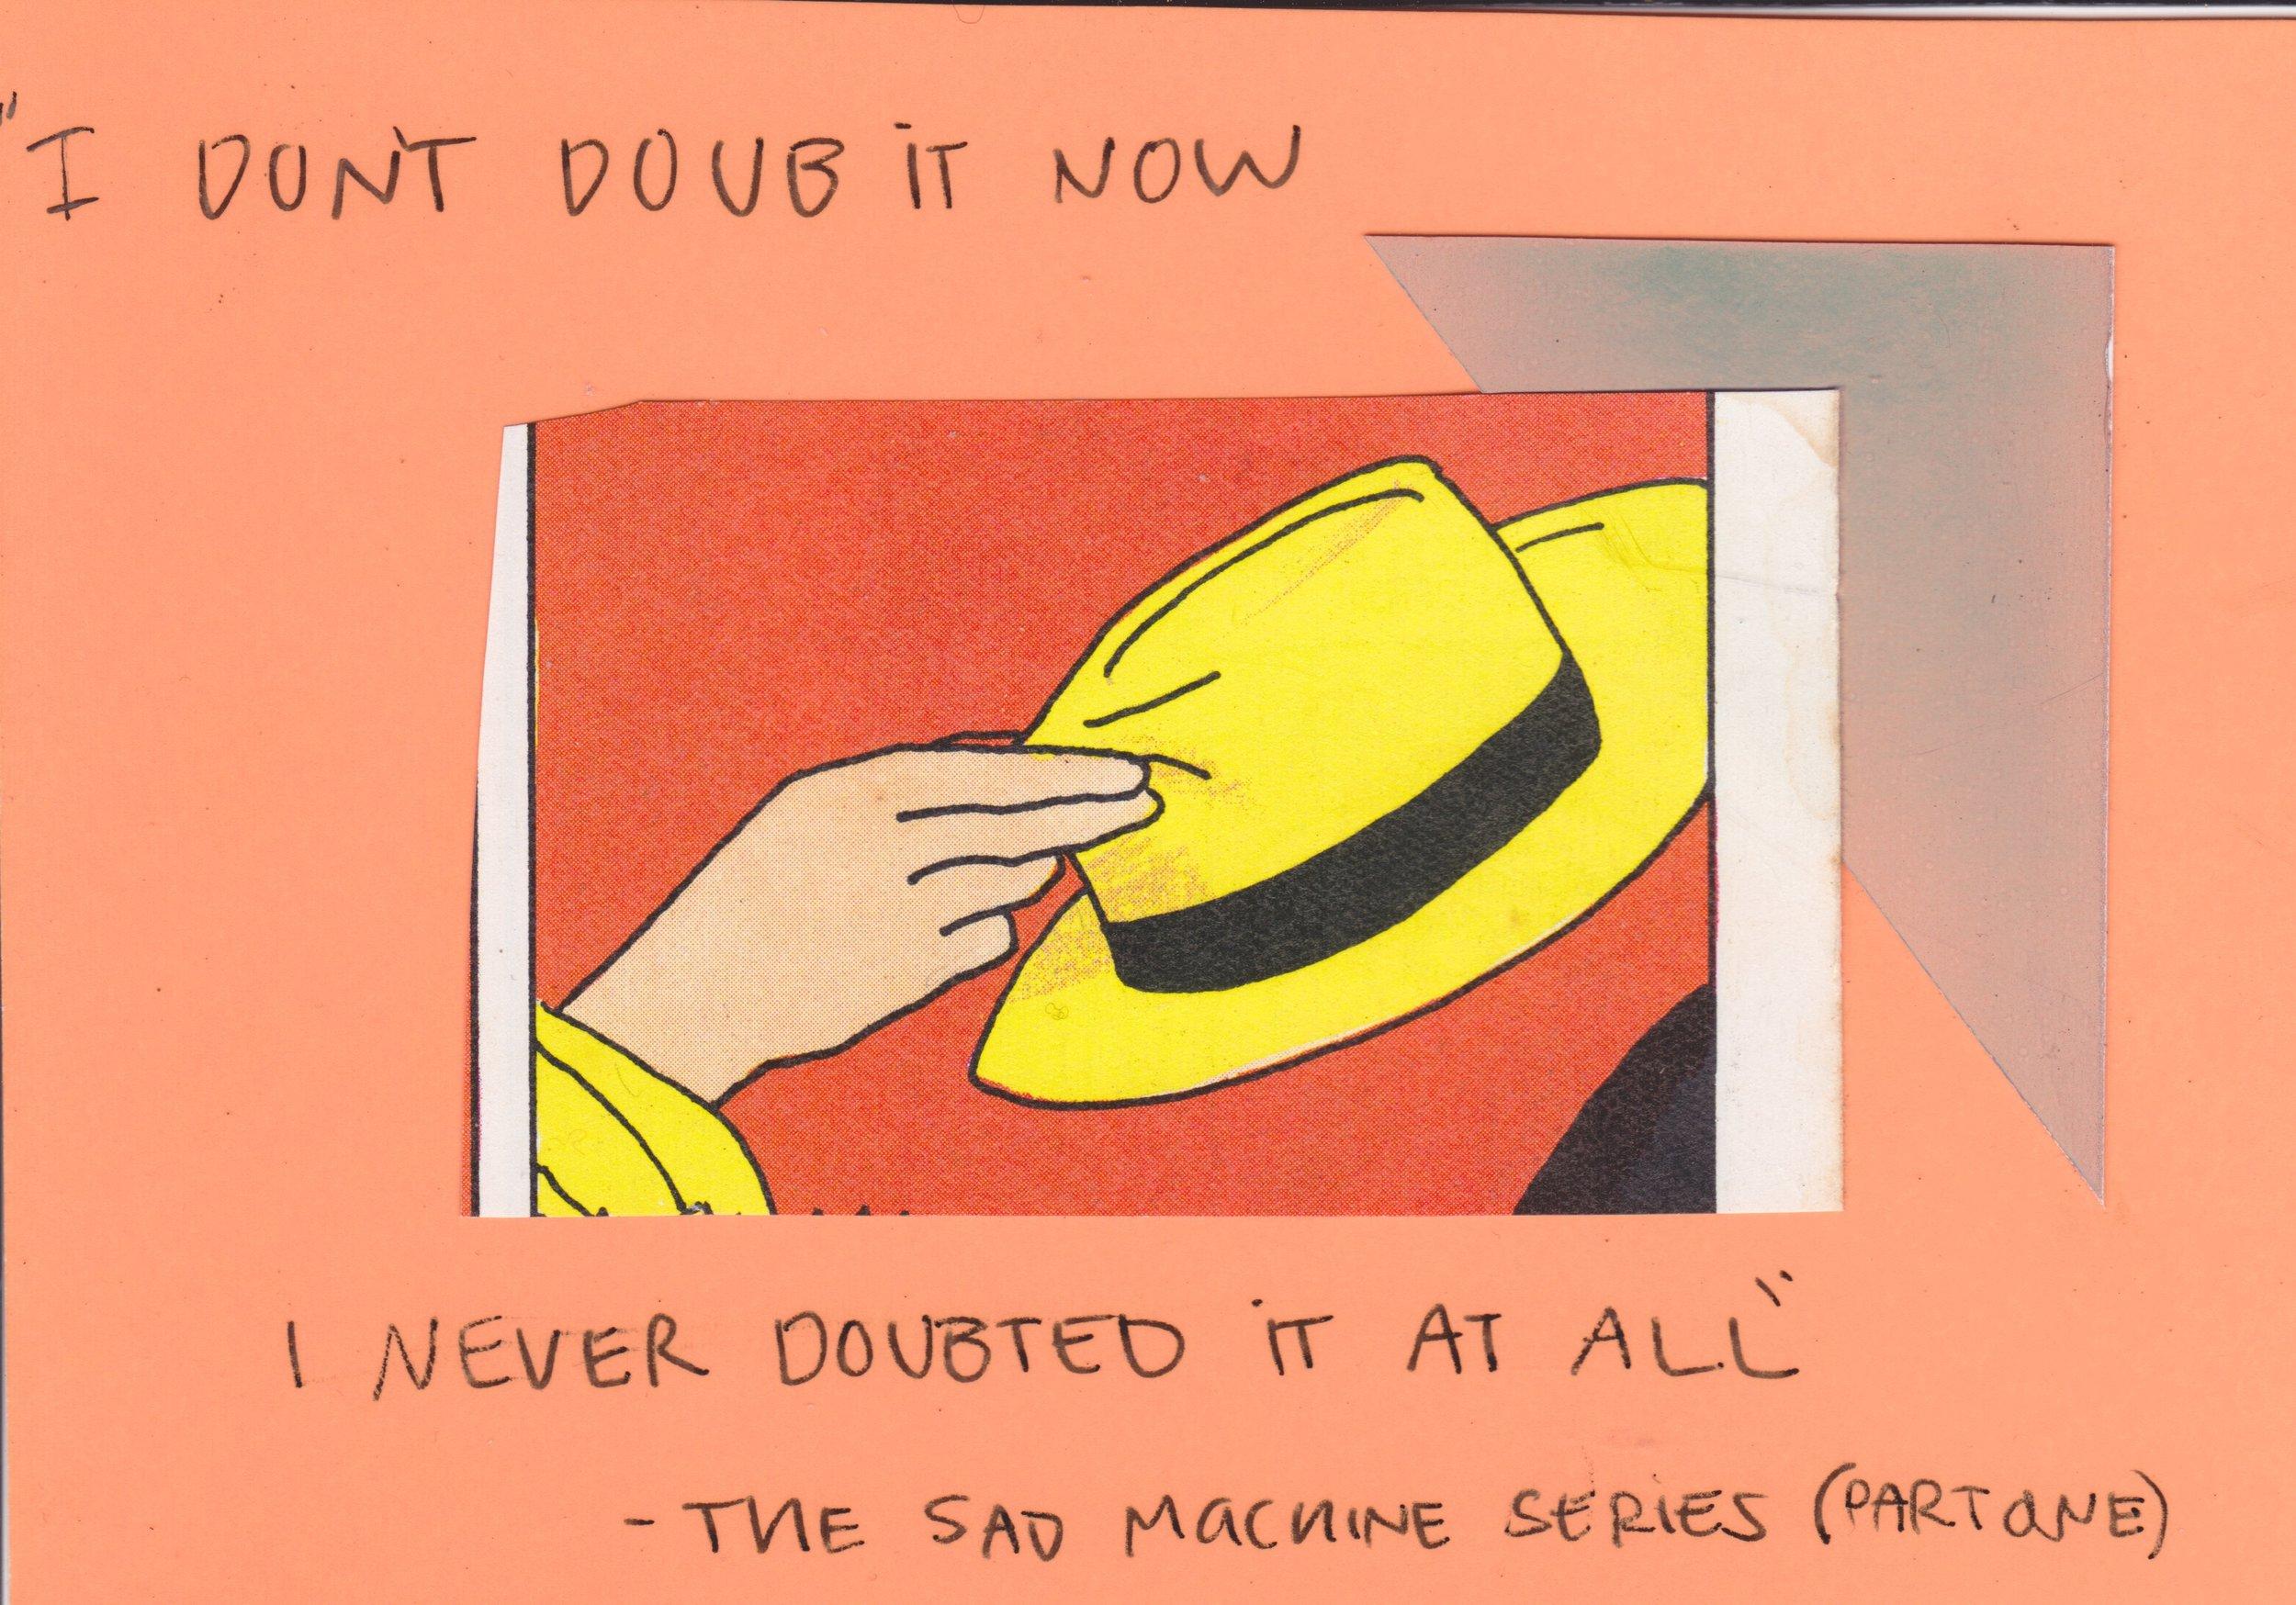 Sad Machine Series Quotes 12.jpeg